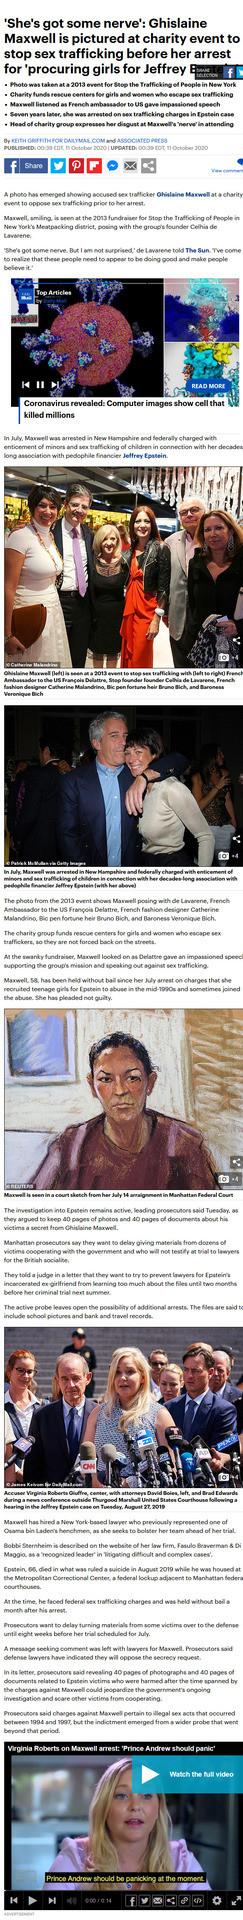 Epstien, Ghislain Maxwell, Charity, scandal,